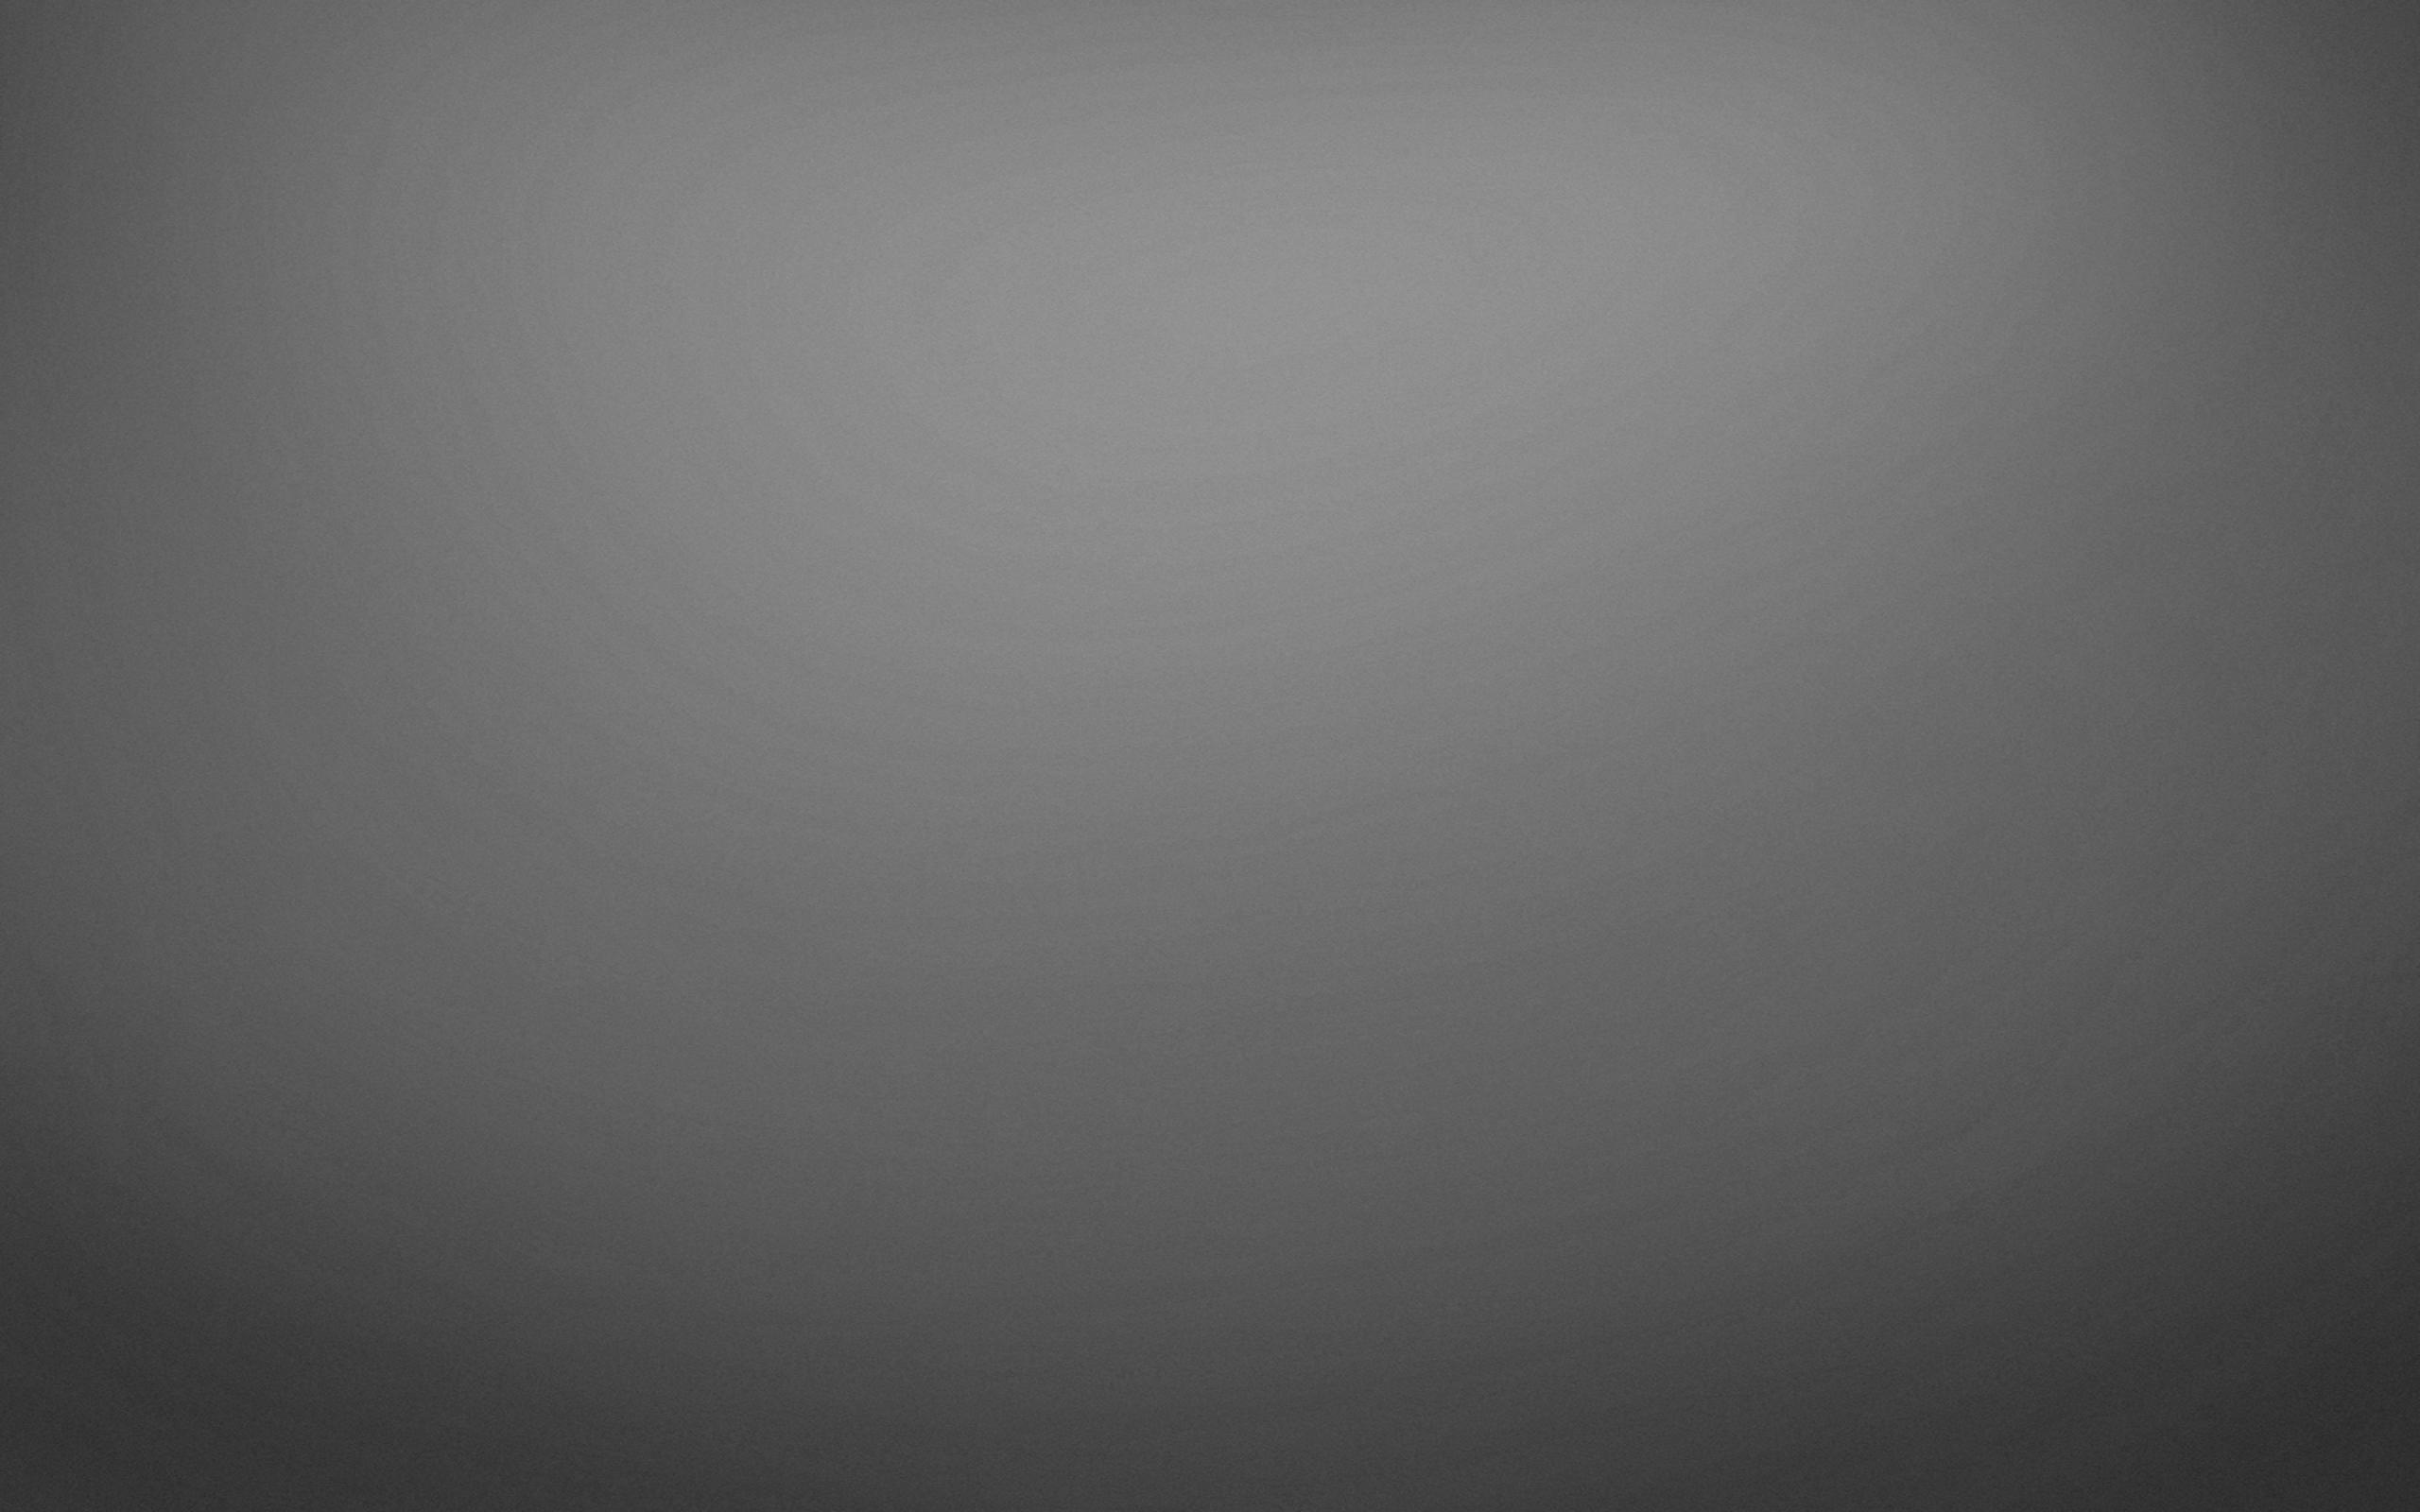 Spots Background Light Solid Color hd wallpaper #66461